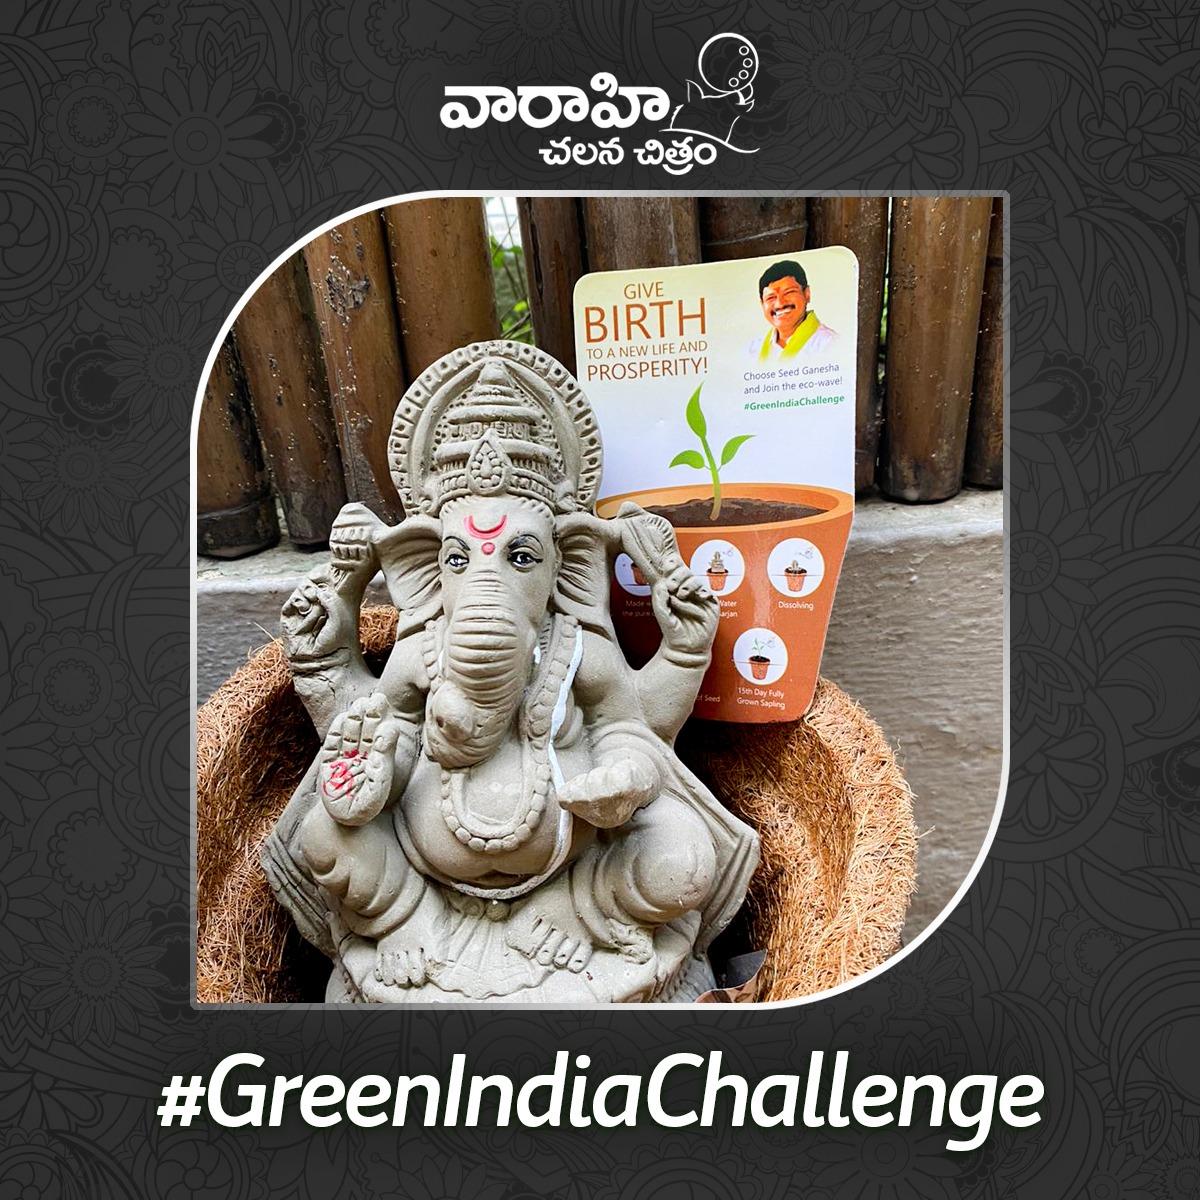 A wonderful initiative by @MPsantoshtrs garu, Thank you for sending this #SeedGanesha.  We request everyone to choose eco- friendly Ganesha and keep the environment Green 💚  #GreenIndiaChallenge. https://t.co/cW0AhbudyE